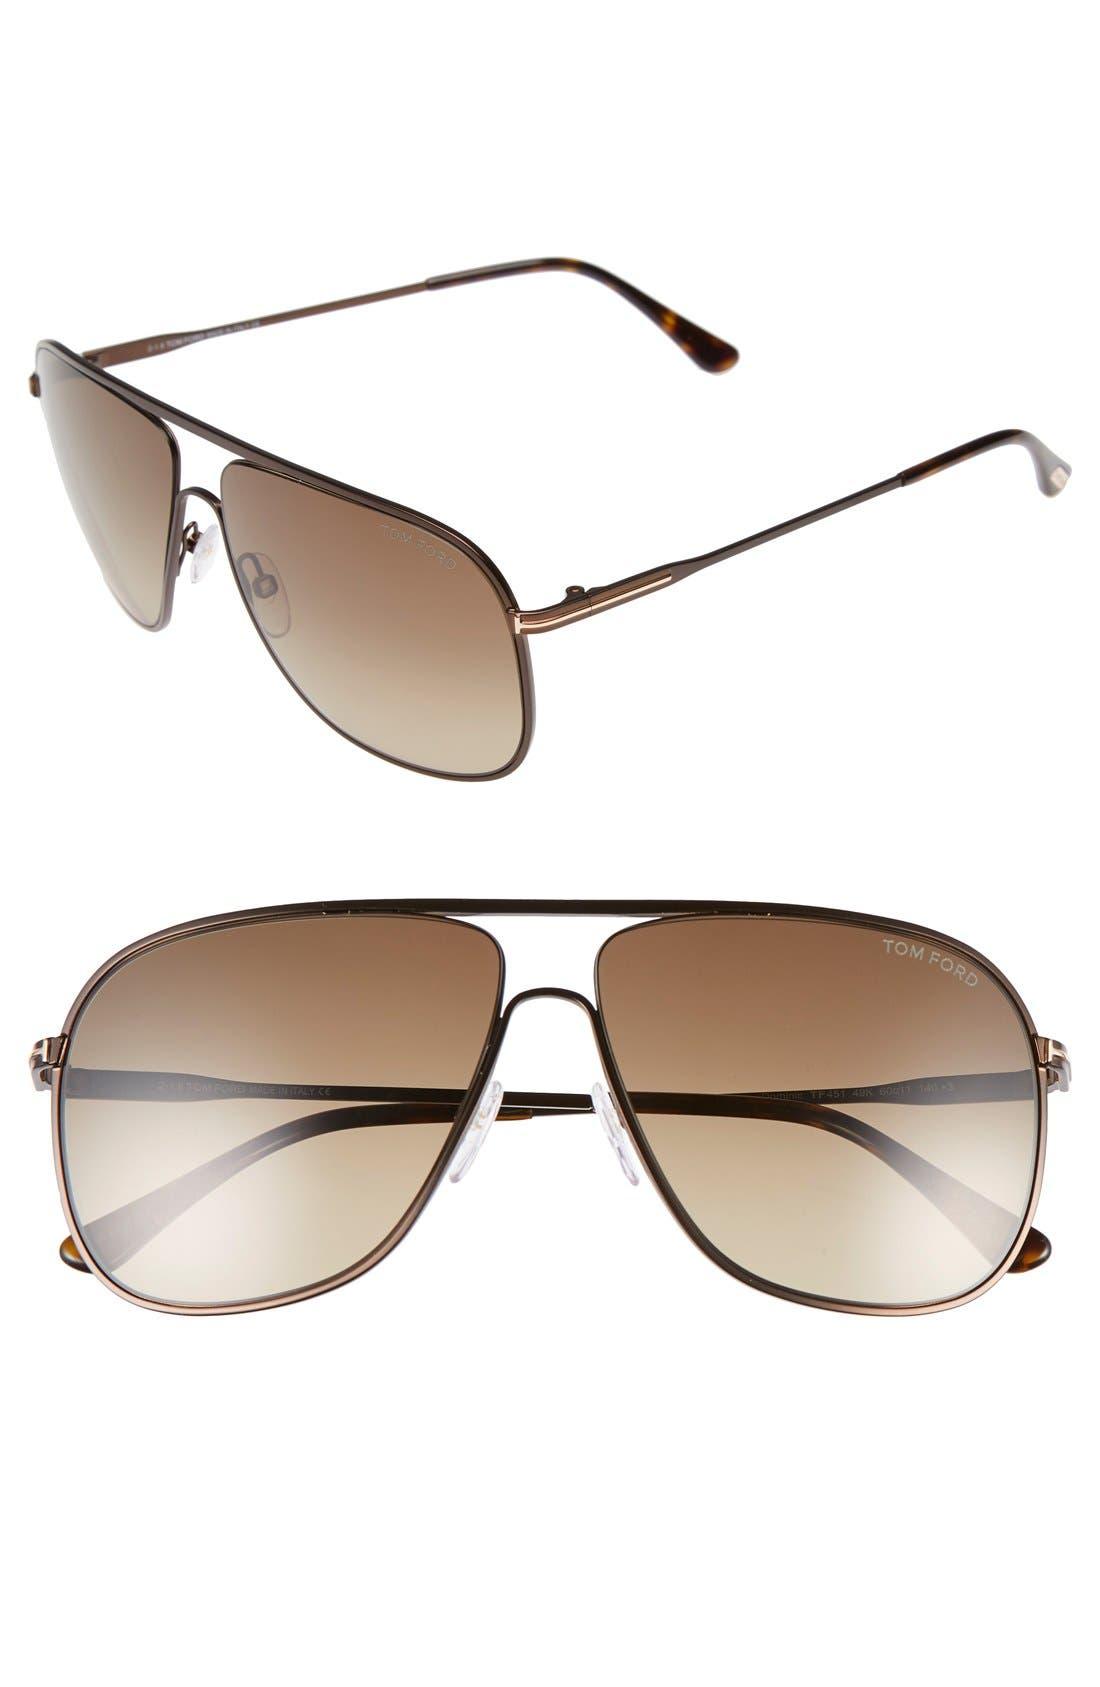 60mm Matte Aviator Sunglasses,                         Main,                         color, 240